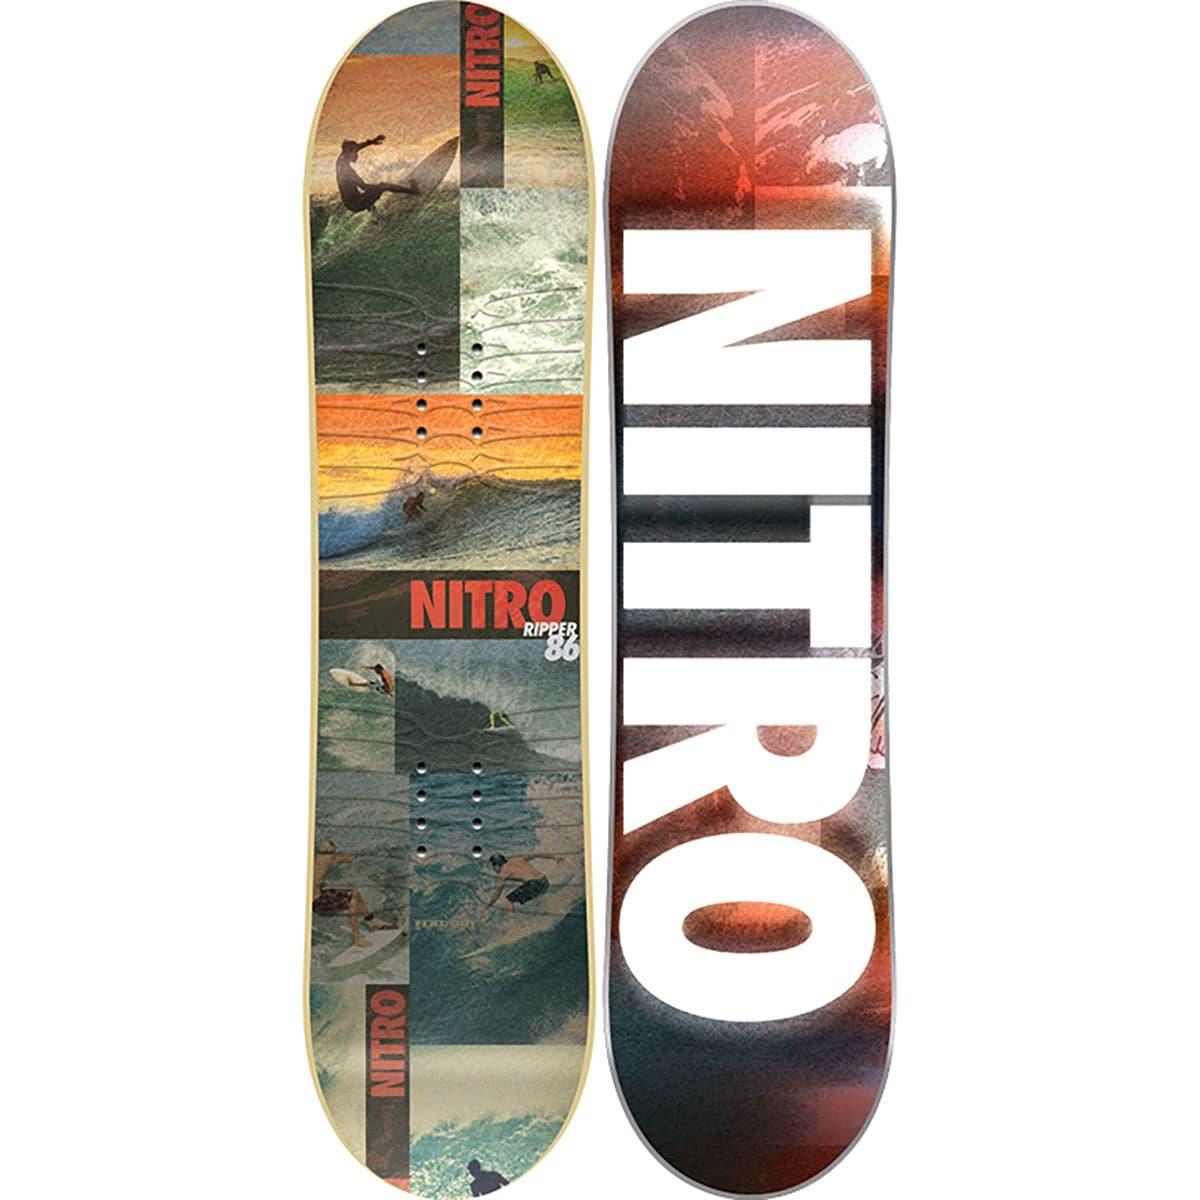 cfc1ee460524 Nitro Ripper Snowboard Kids One Color 126cm